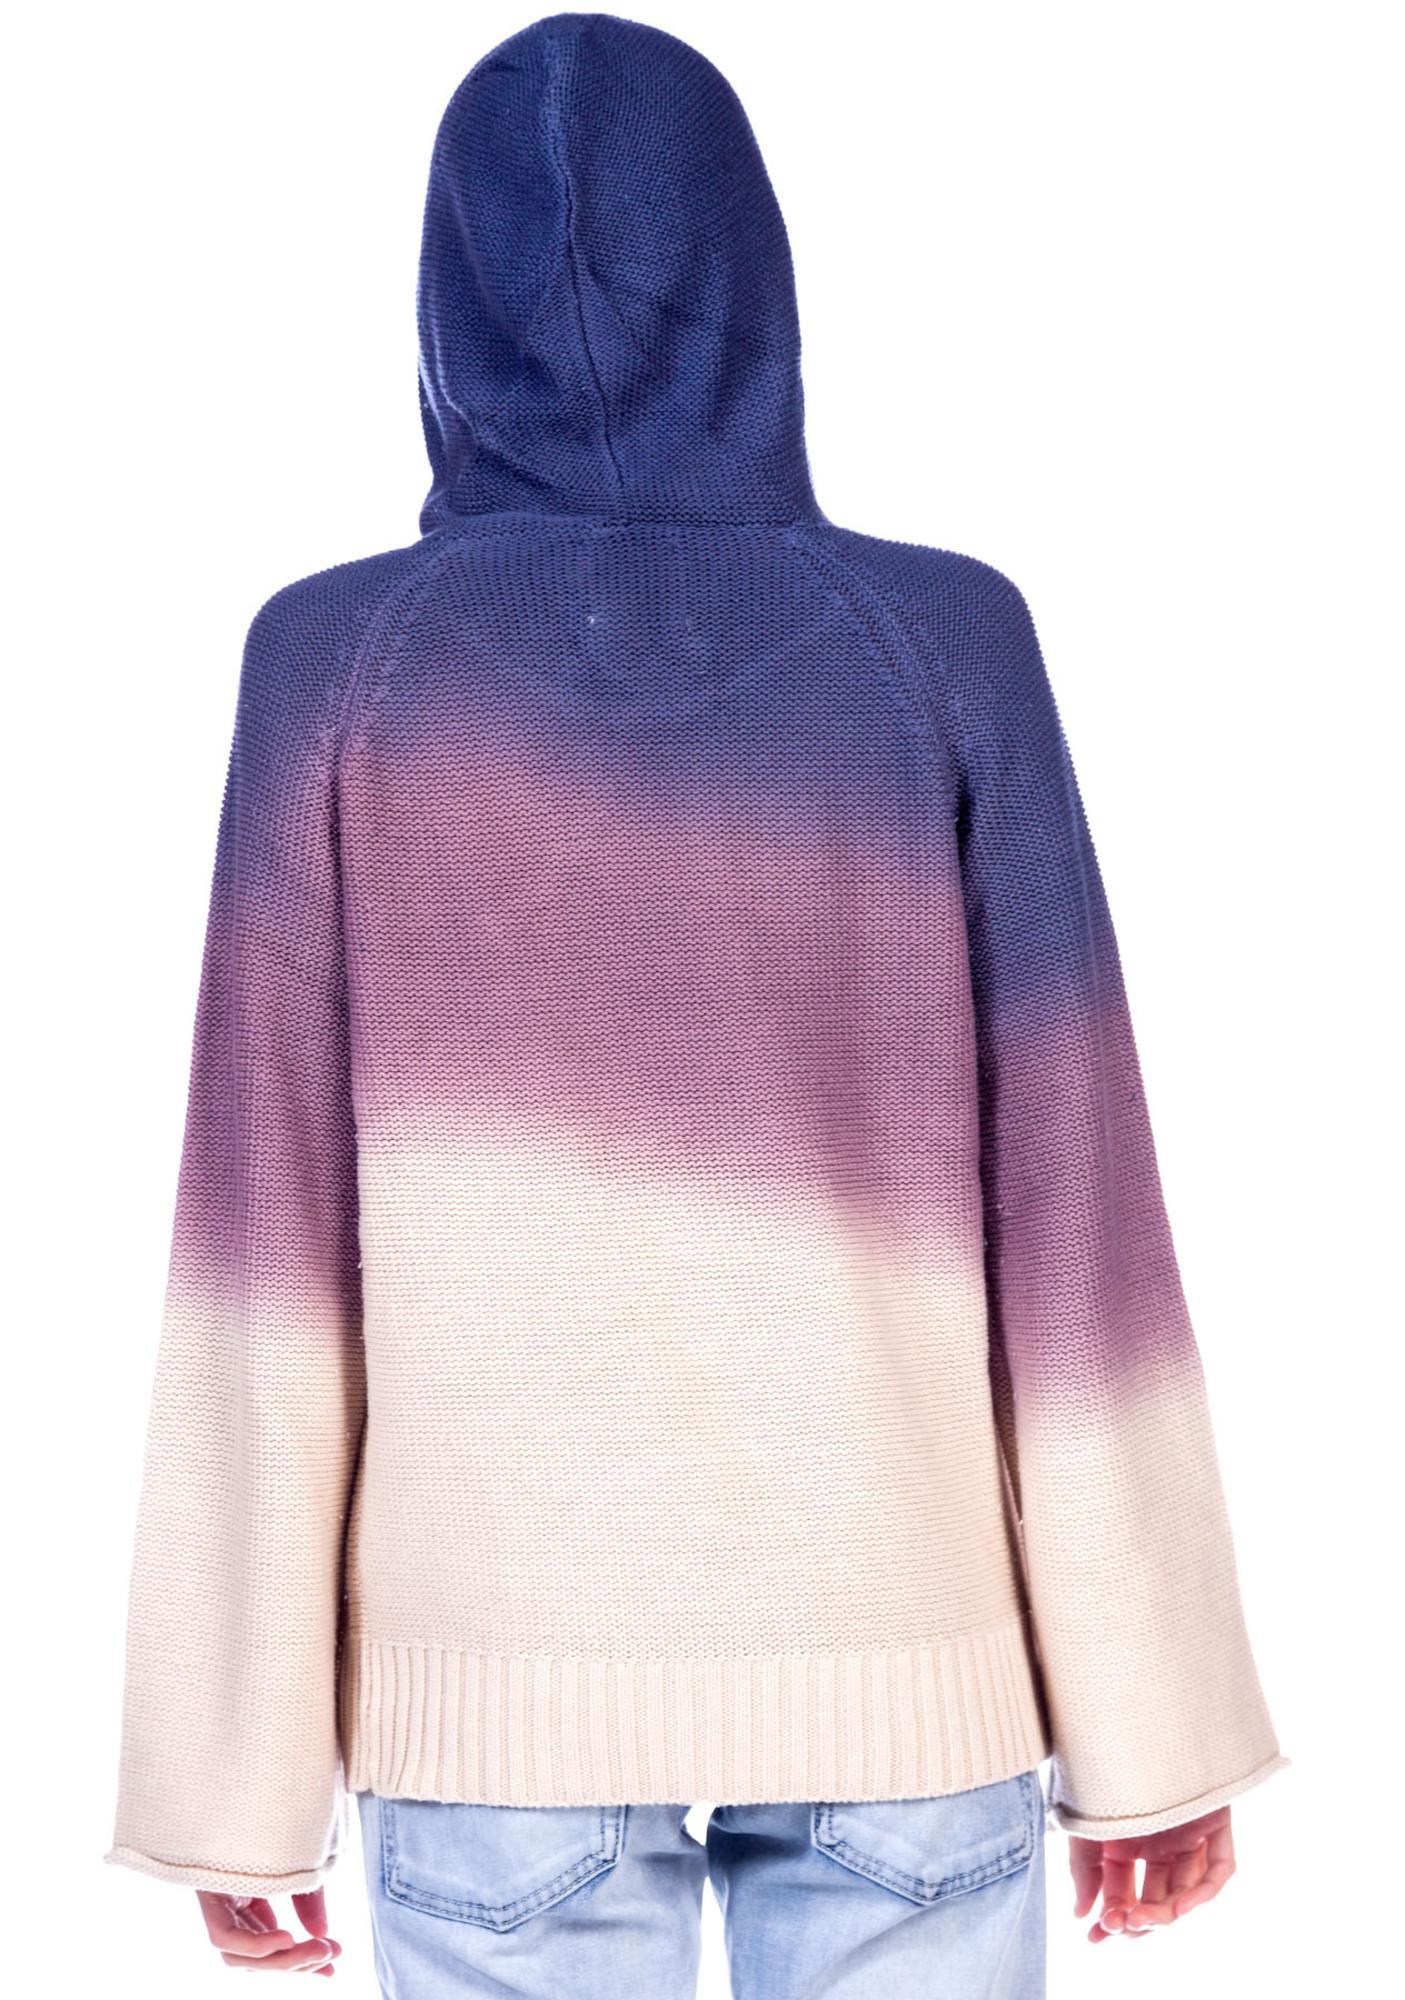 Chaser Dip Dye Pullover Hoodie